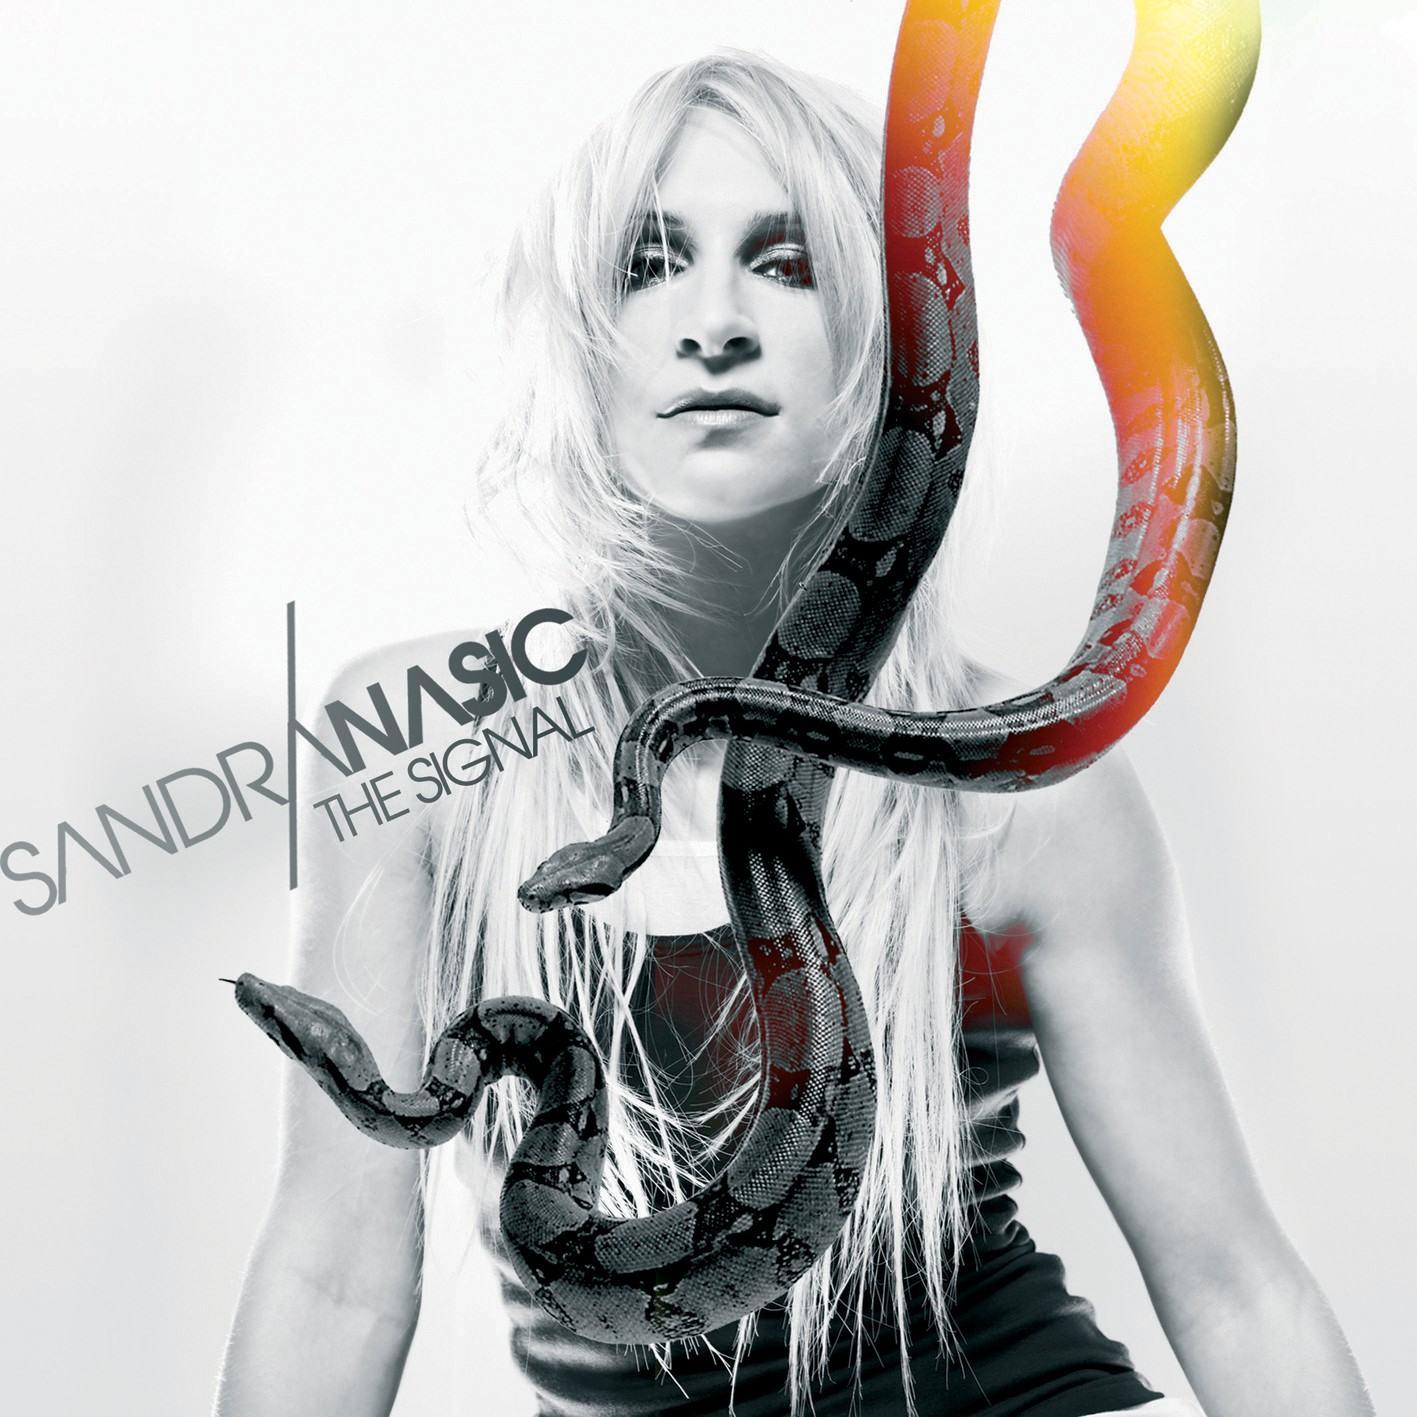 Sandra Nasic: The Signal (2007) Book Cover